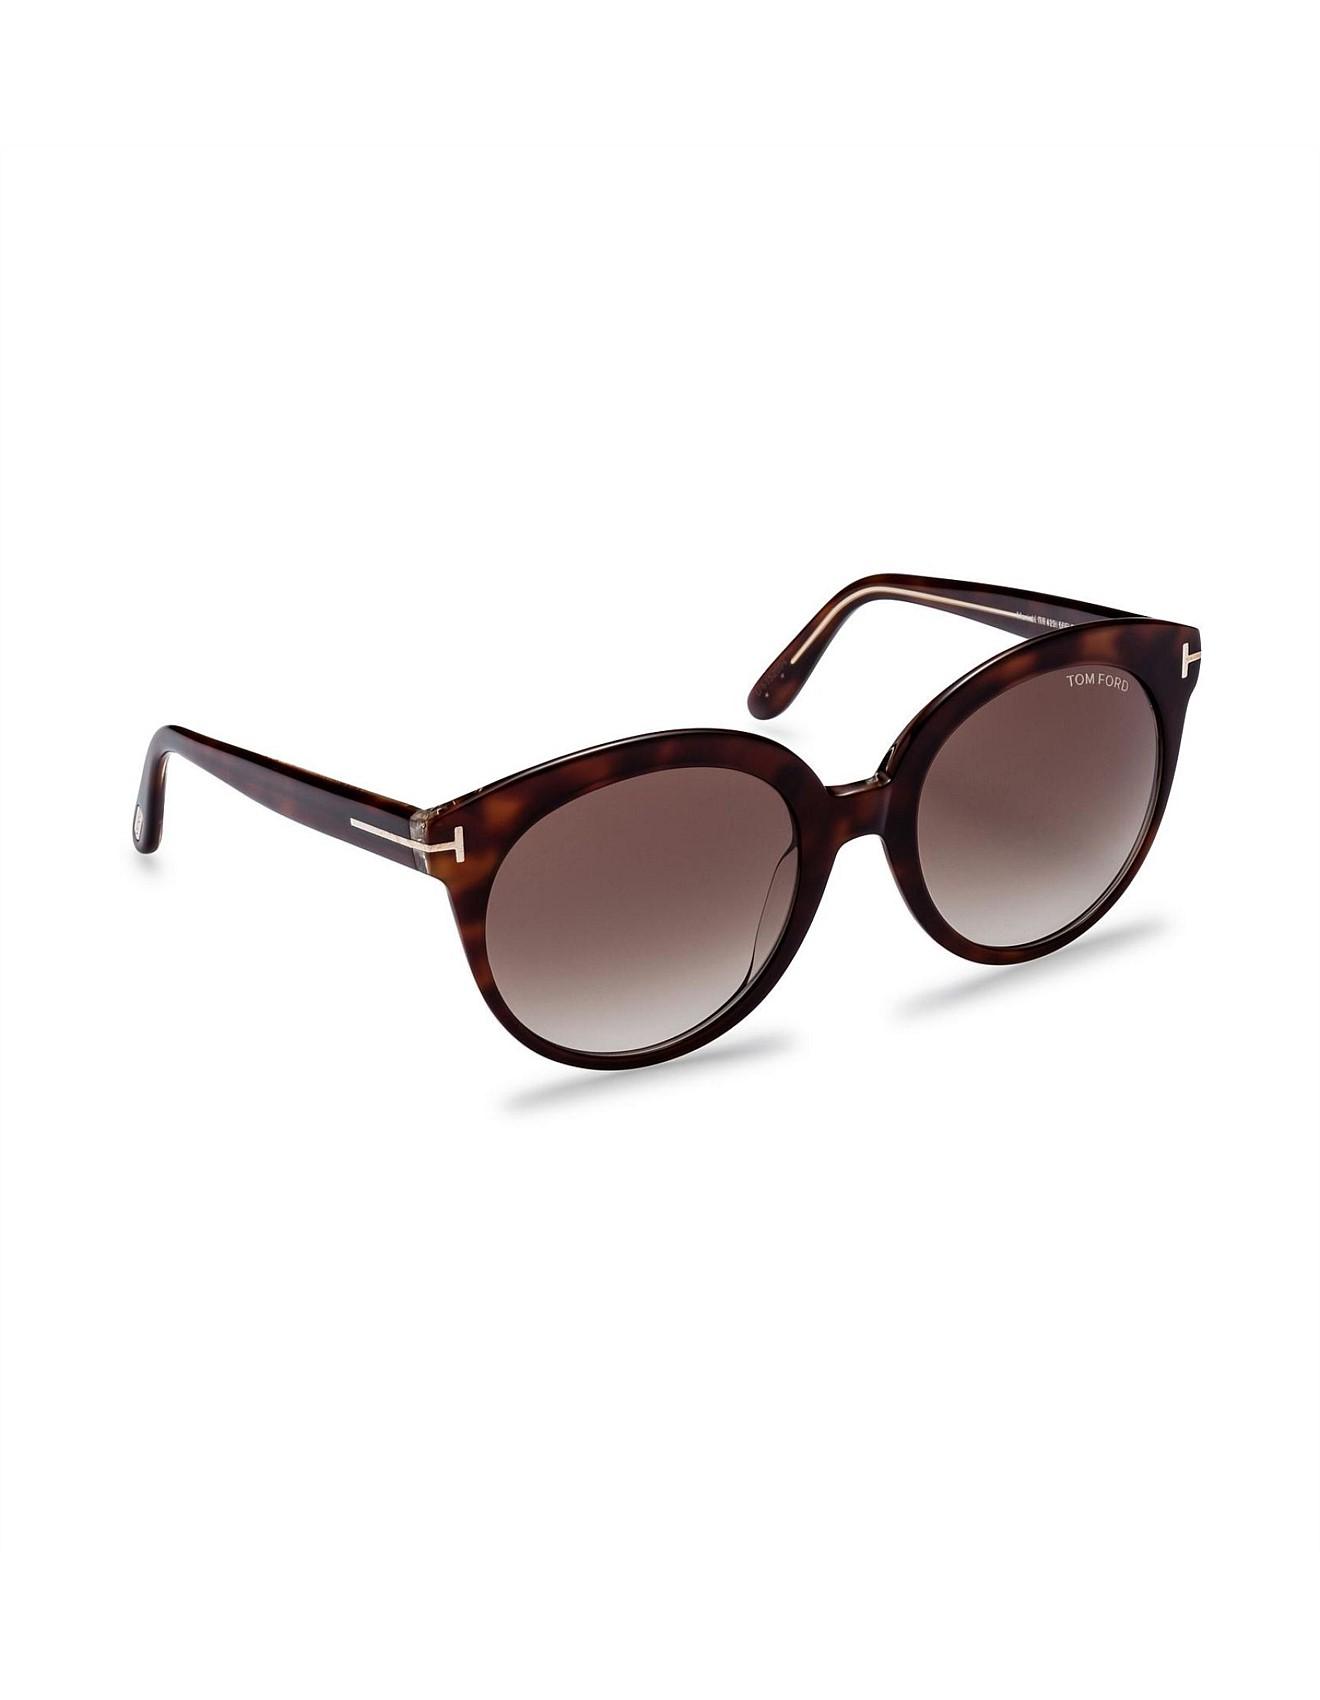 3a47ed54c6 Women s Sunglasses Sale